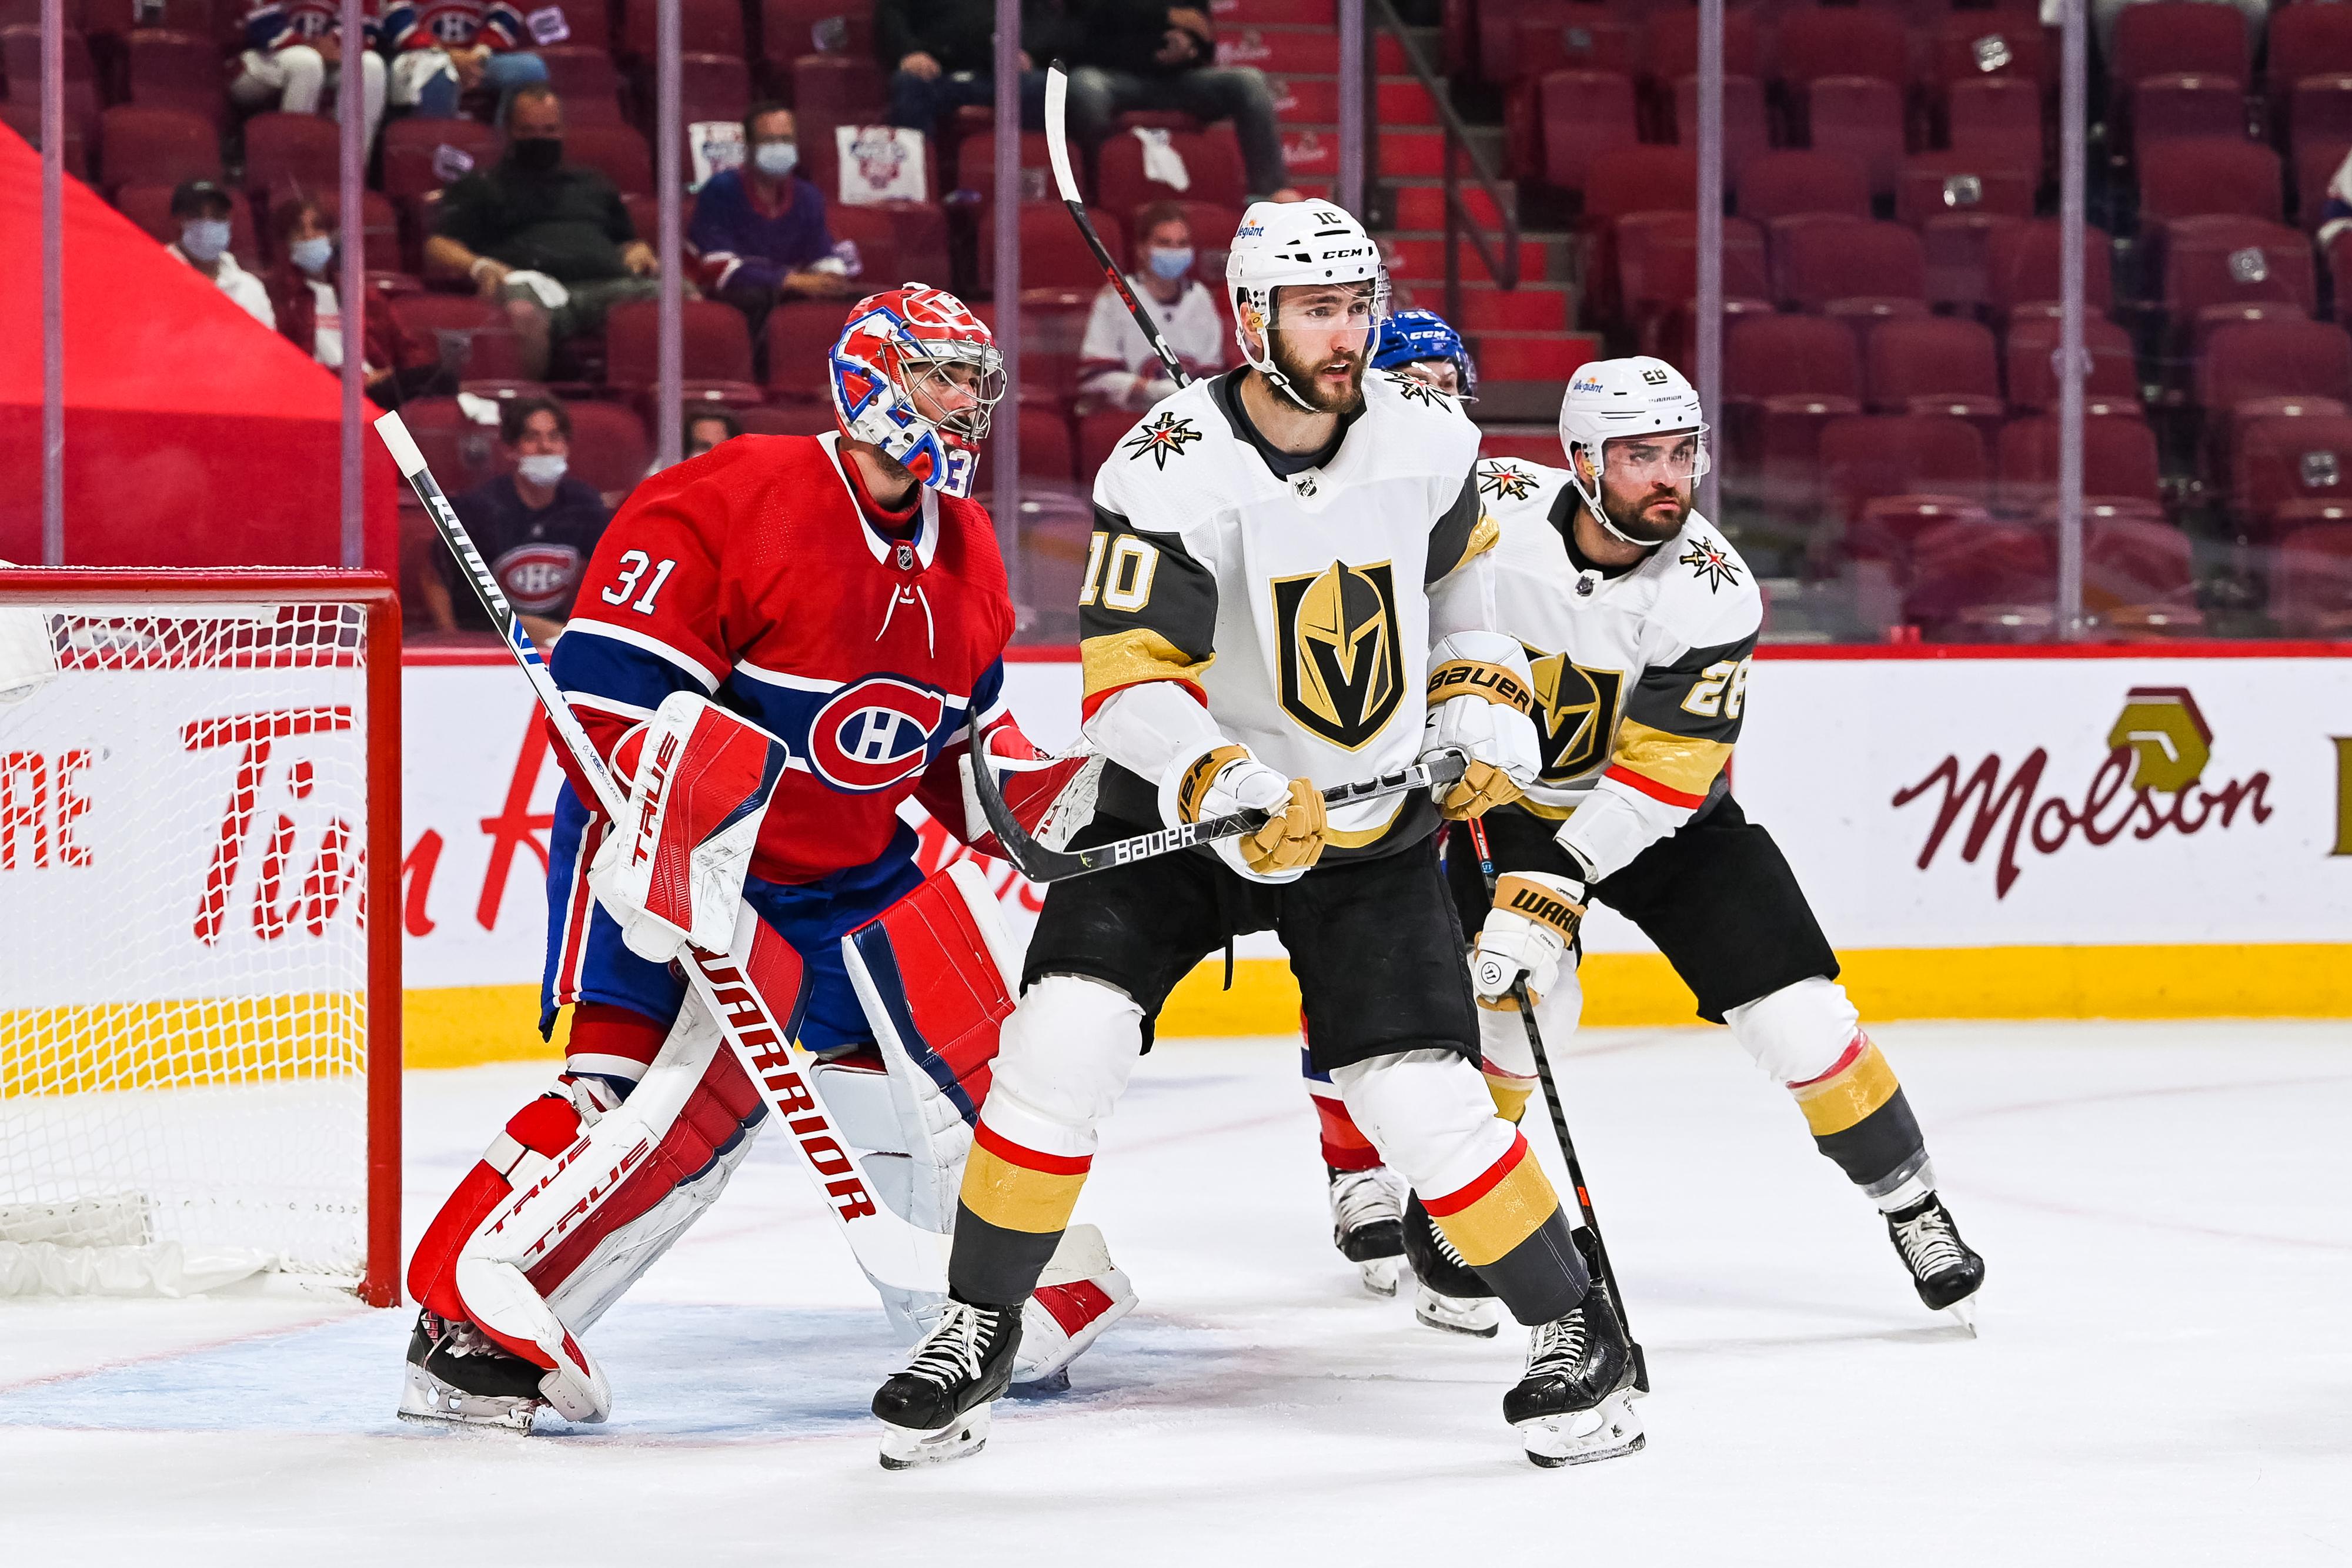 NHL: JUN 20 Stanley Cup Playoffs Semifinals - Golden Knights at Canadiens